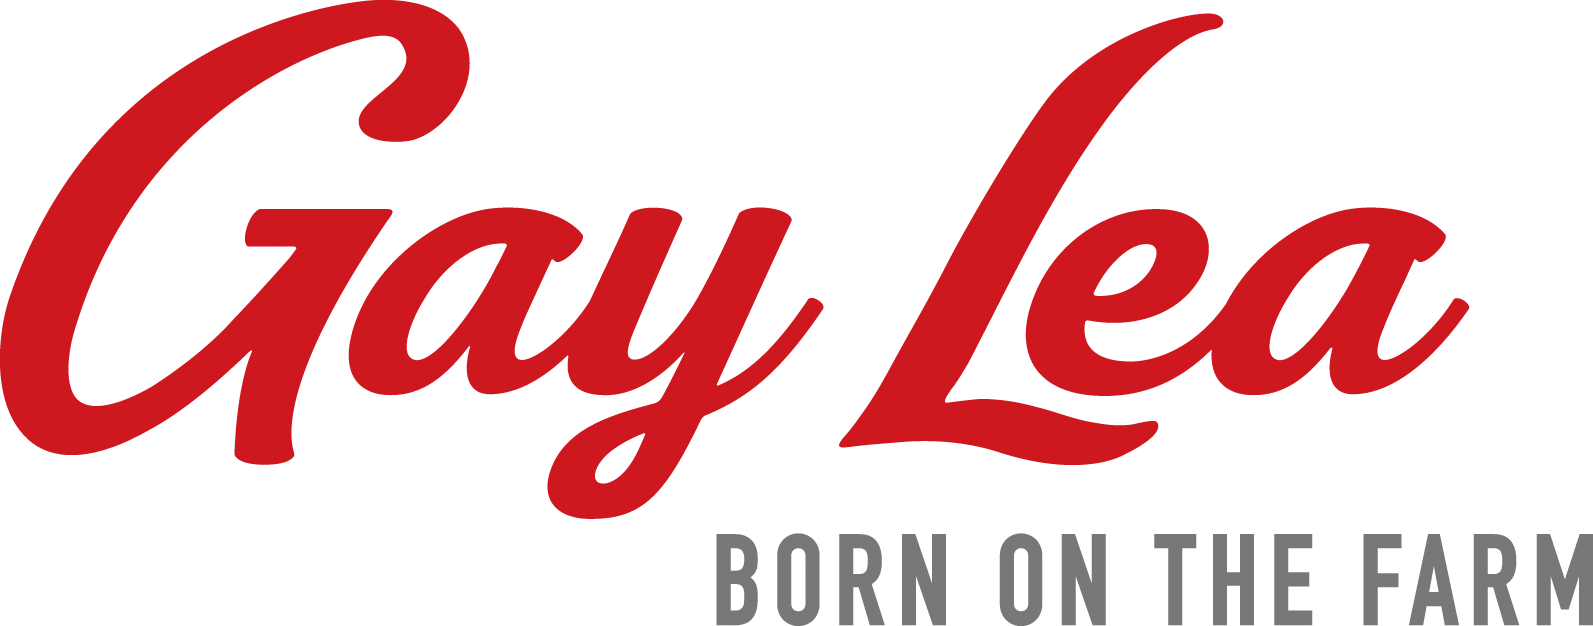 Canadian dairy sector failed again by Ottawa – Gay Lea Foods